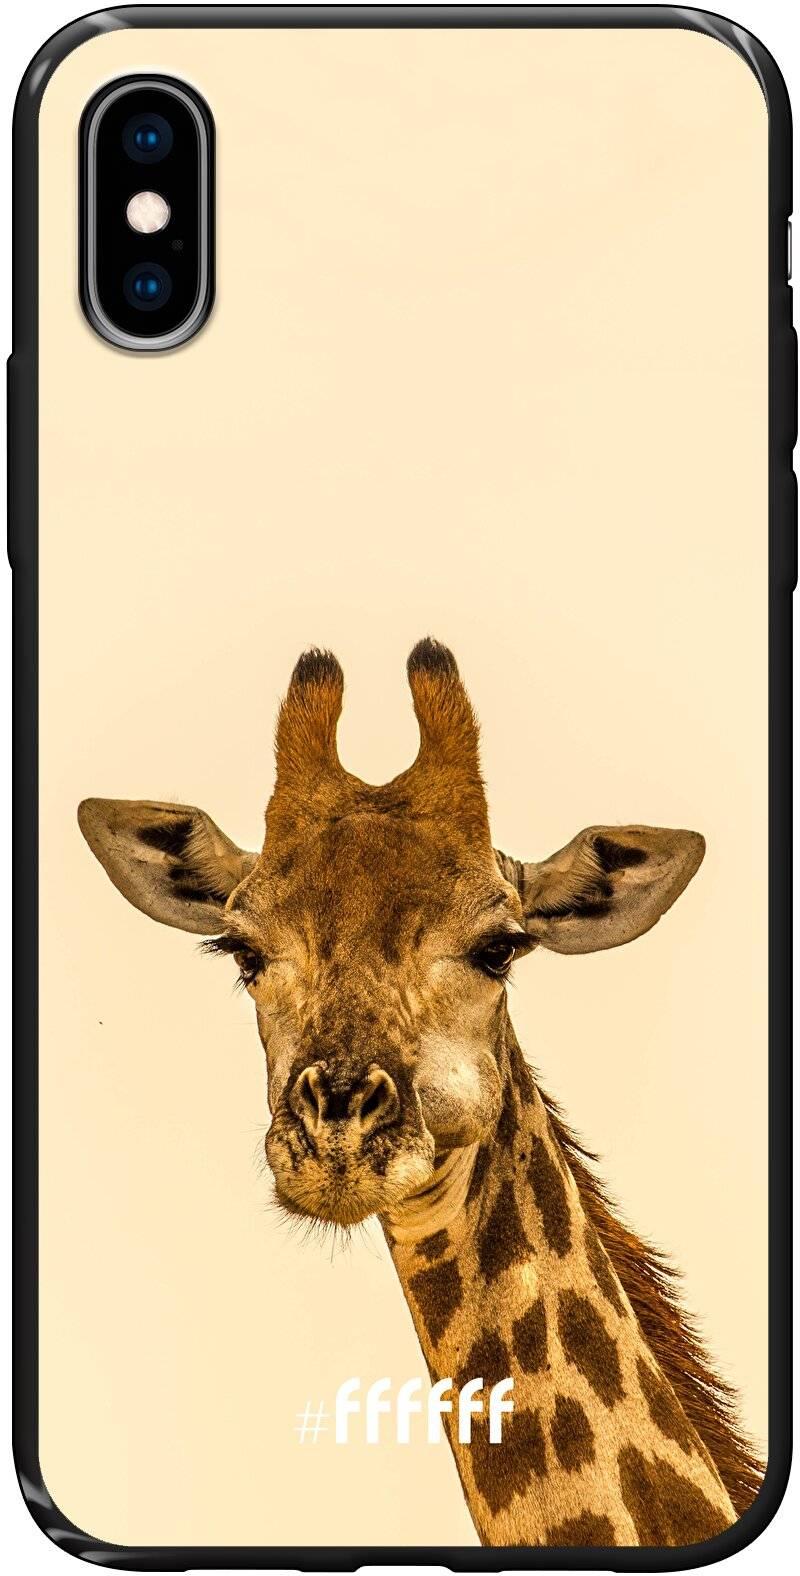 Giraffe iPhone X